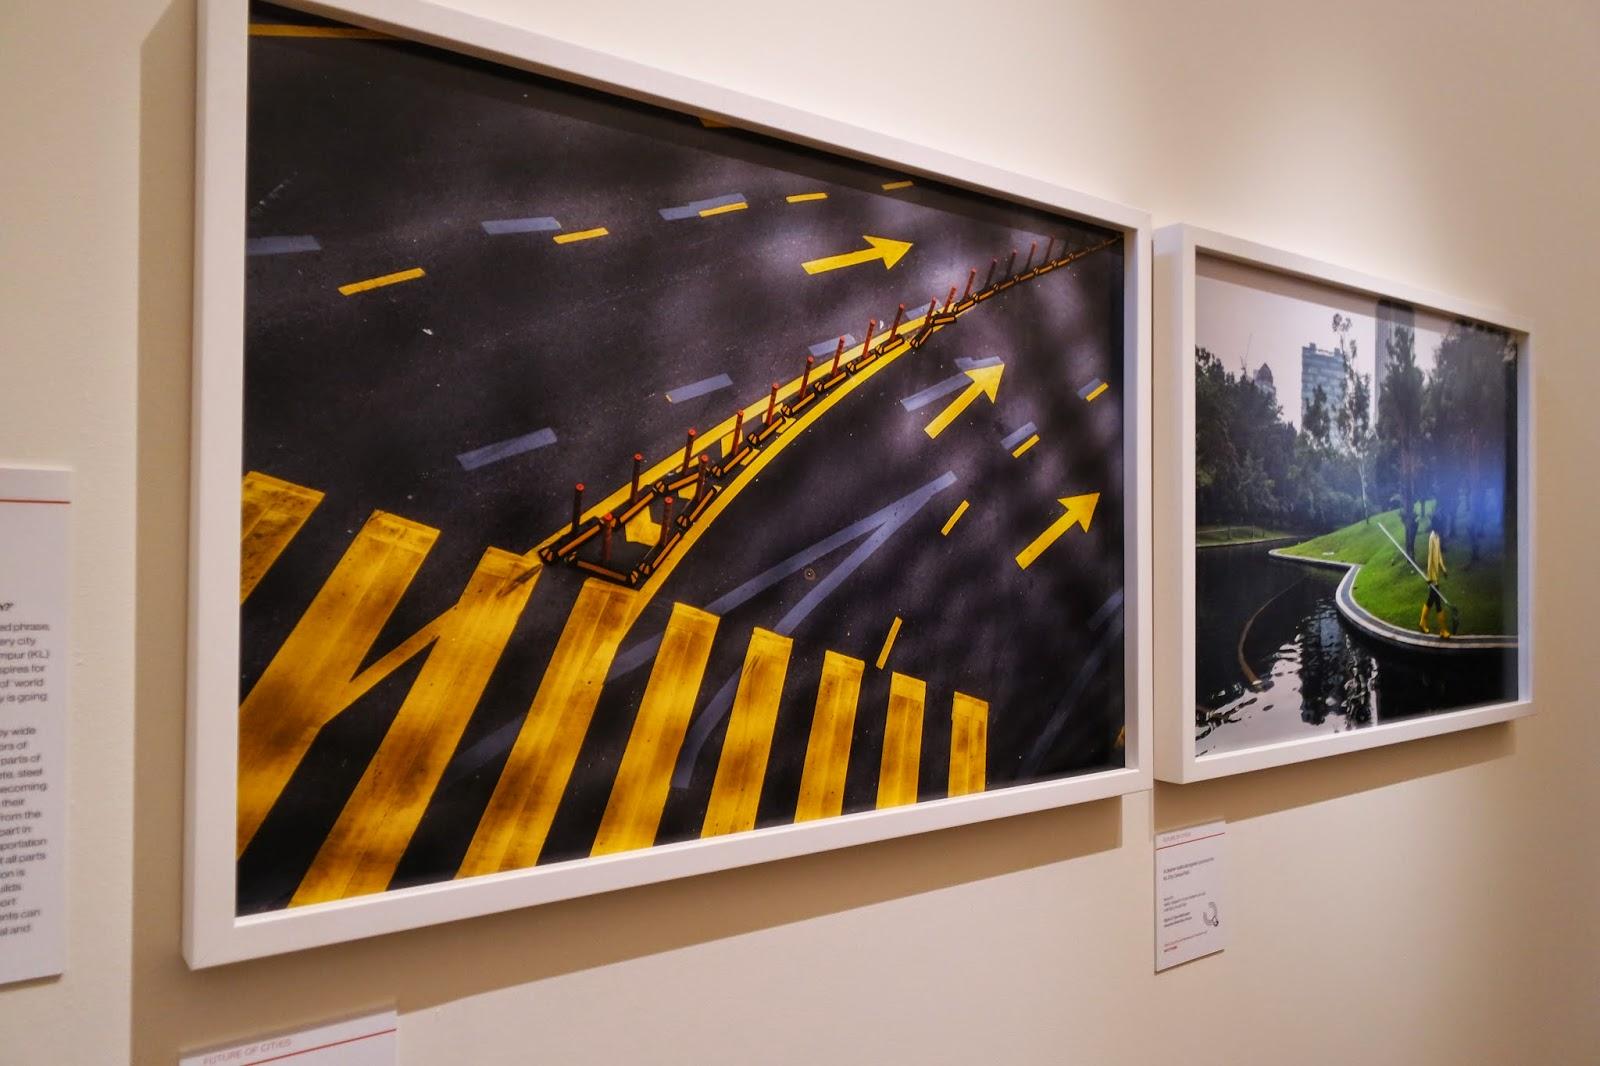 2015 Sony World Photography Awards Exhibition